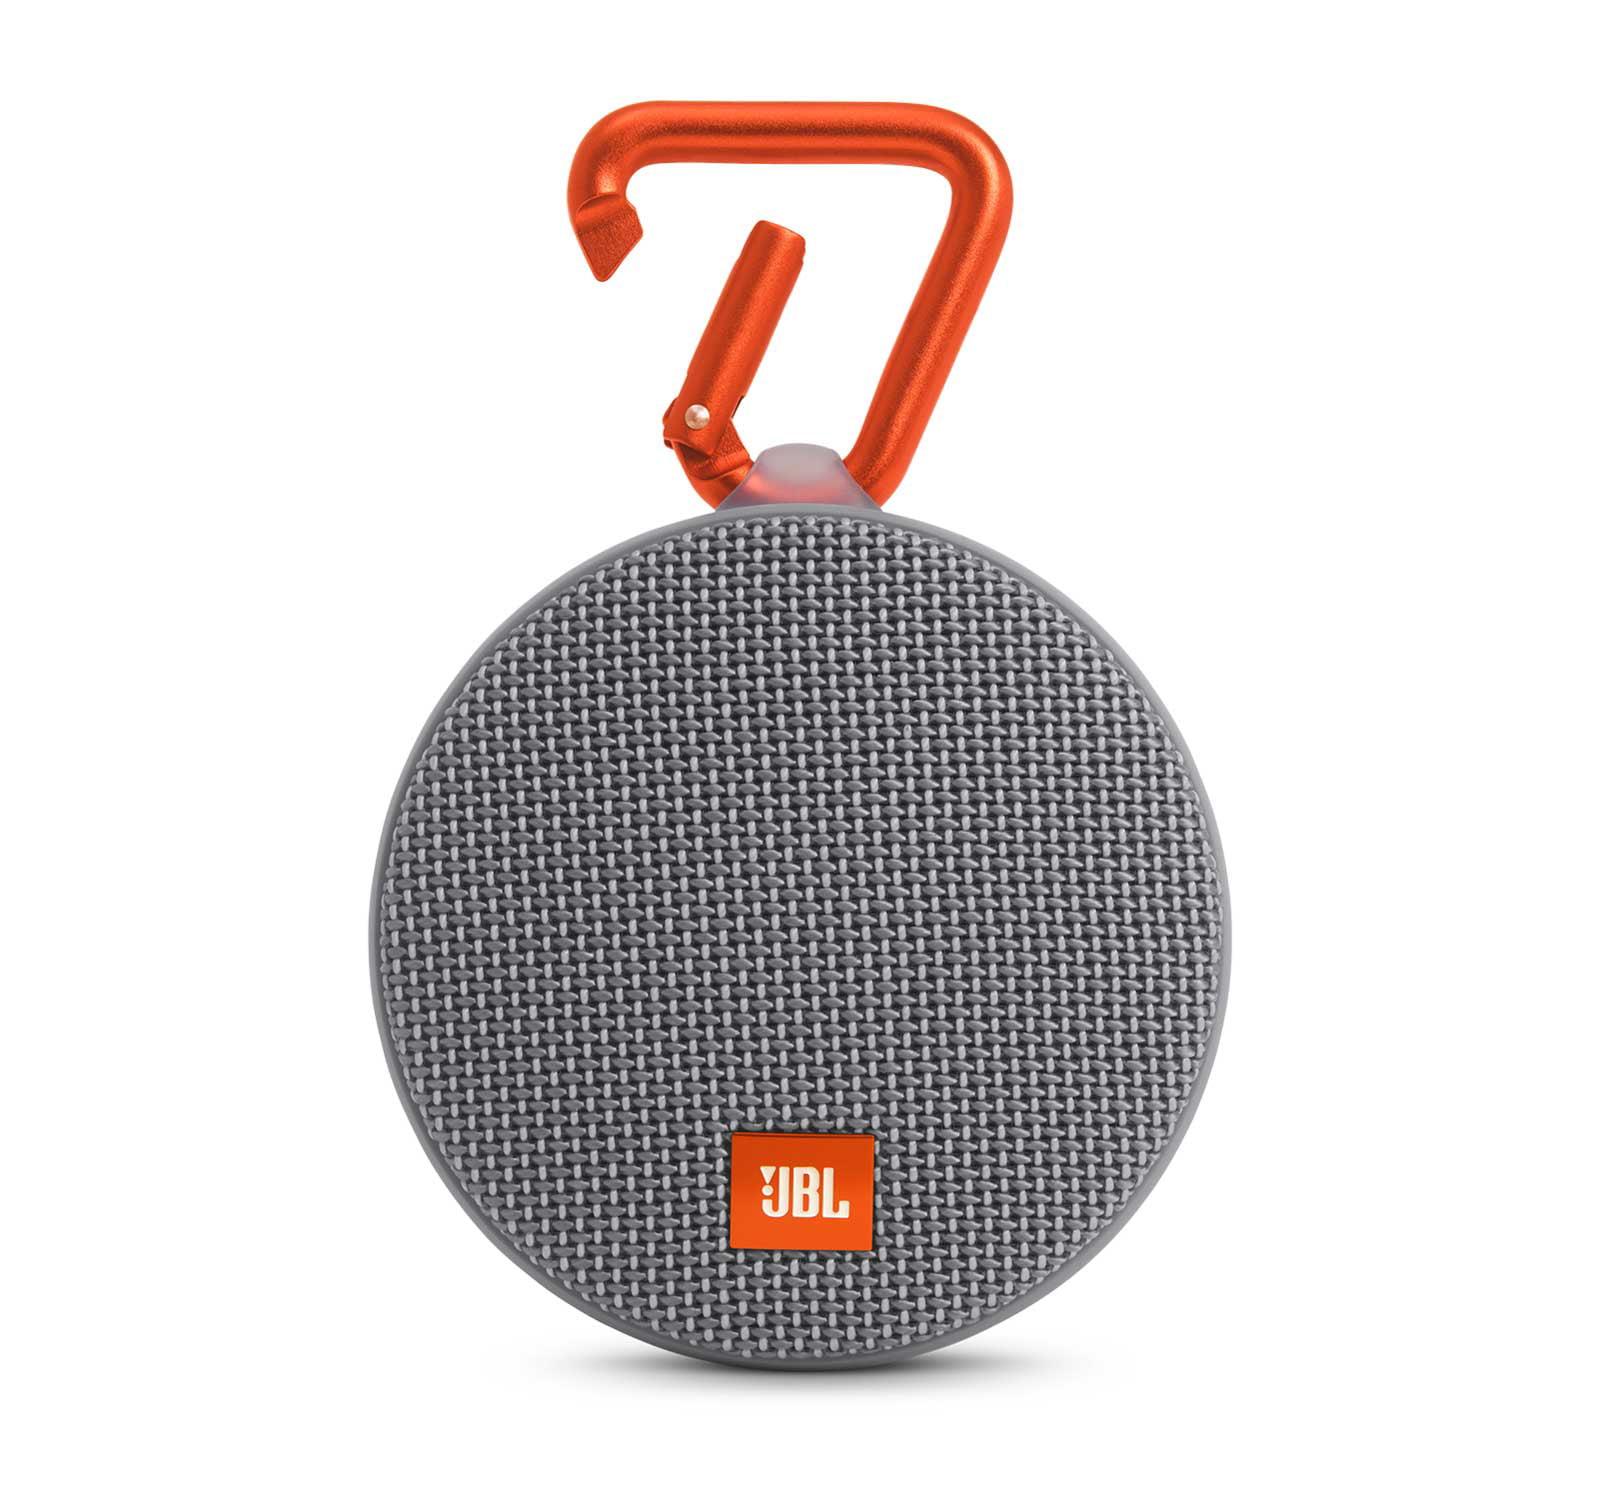 Parlante Ultra portátil Bluetooth altavoz JBL CLIP2 + JBL en Veo y Compro